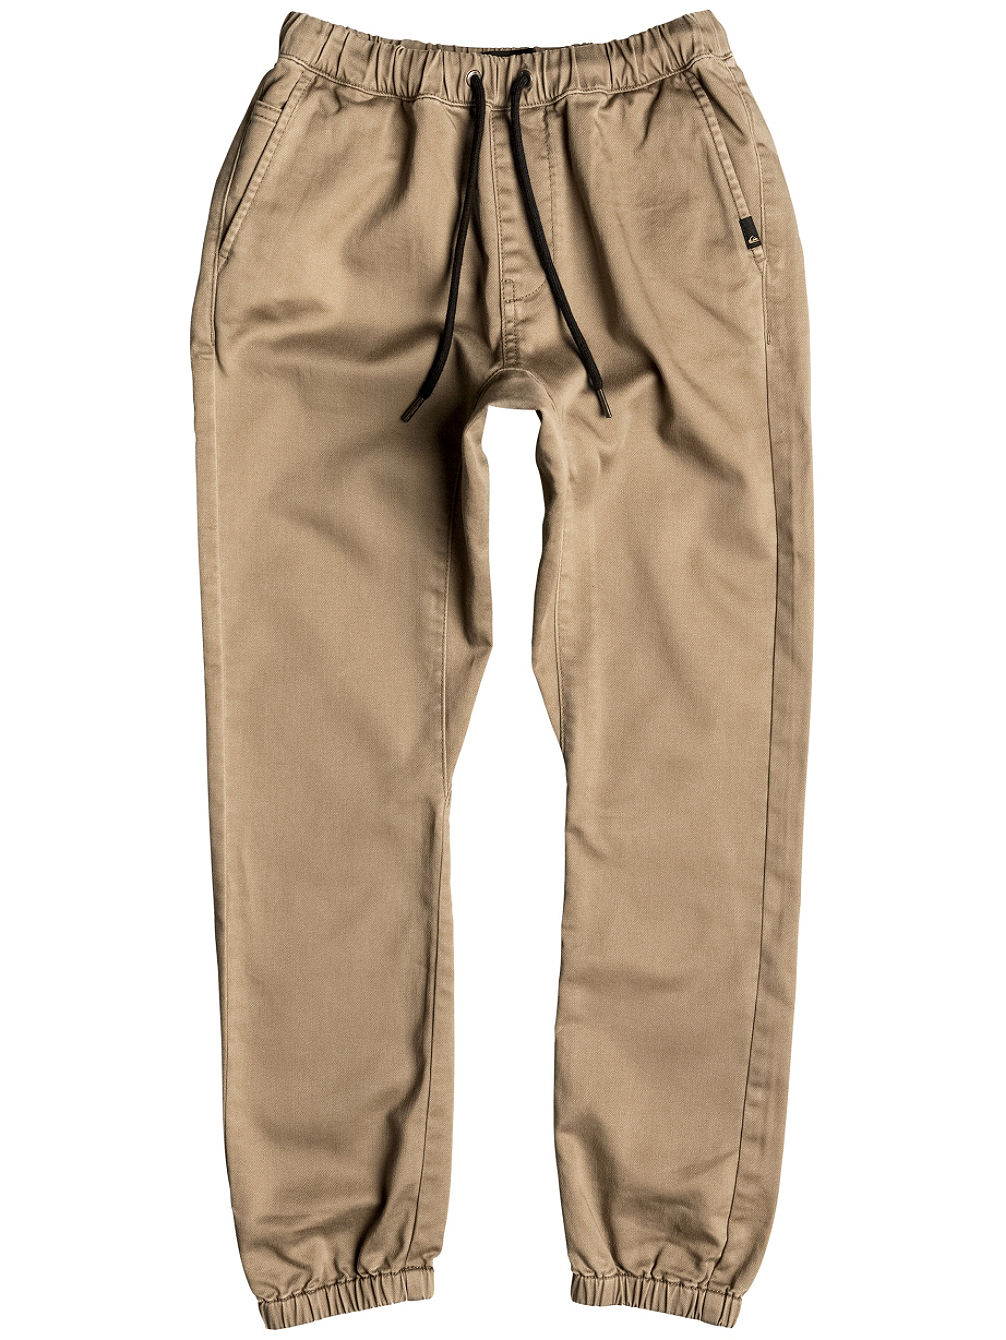 094e63dfaef Buy Quiksilver Fonic Pants Boys online at Blue Tomato